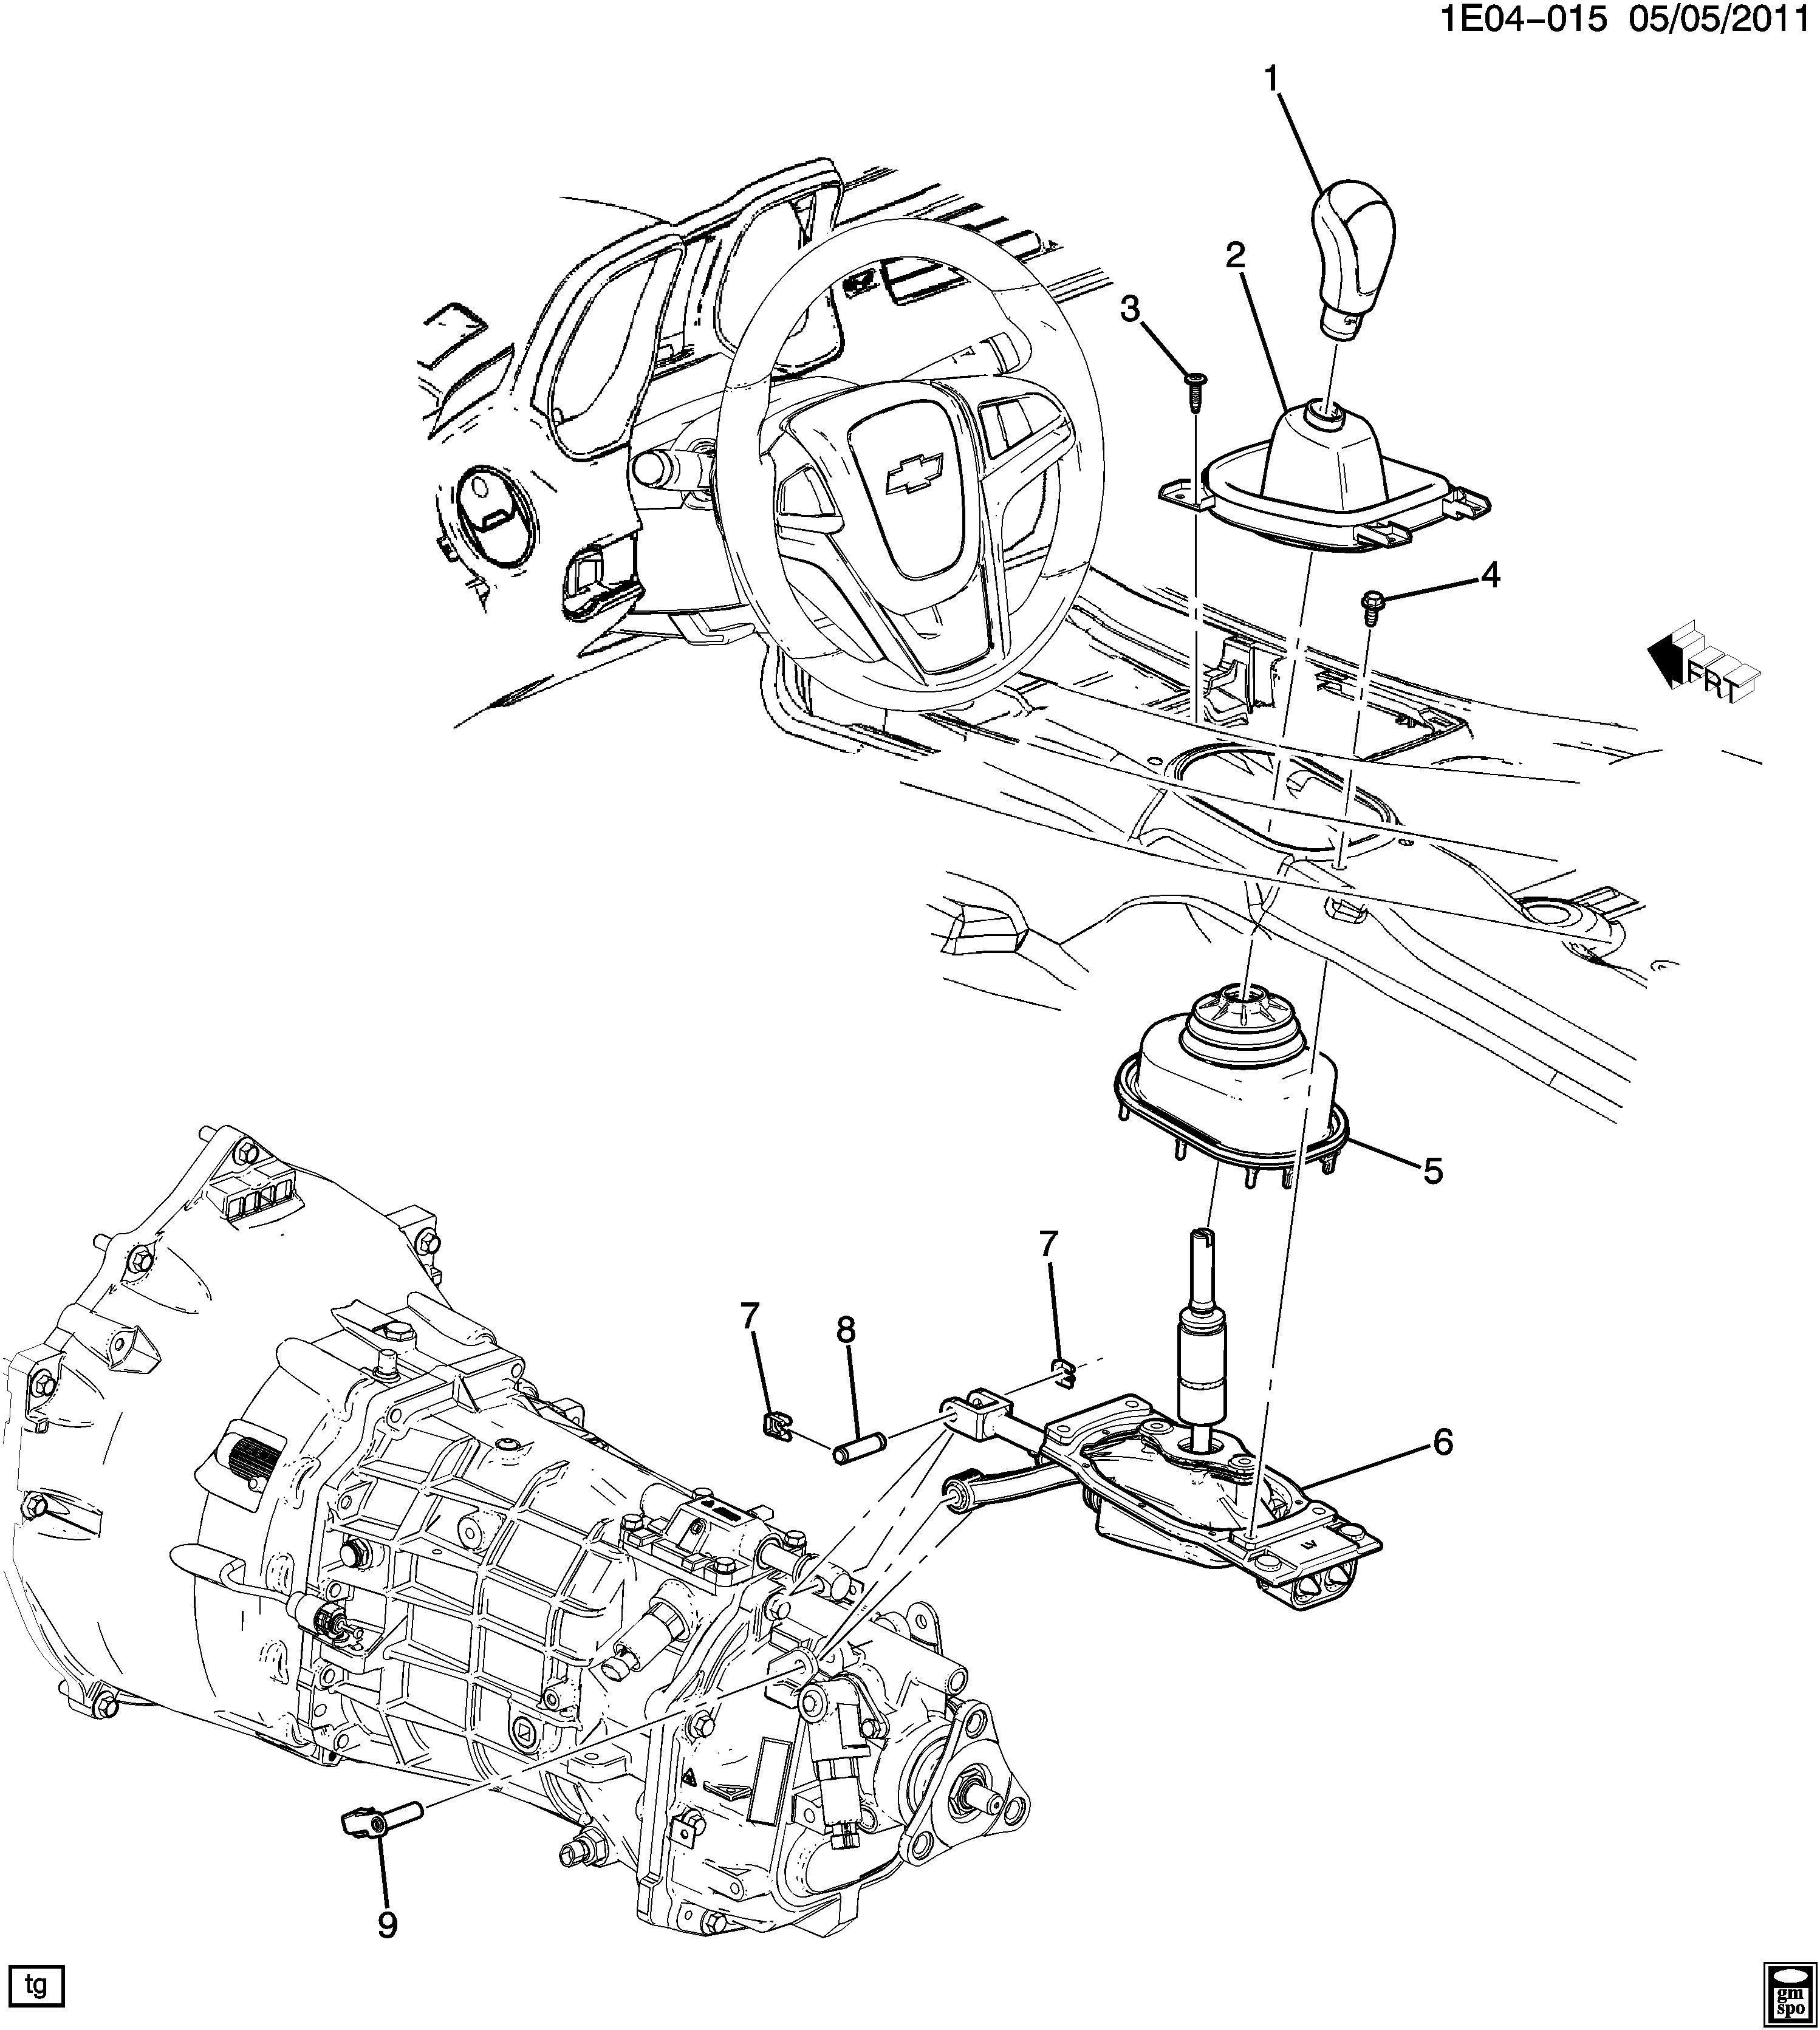 Chevrolet Camaro SS (2SS) 2DR Pin. Transmission shifter